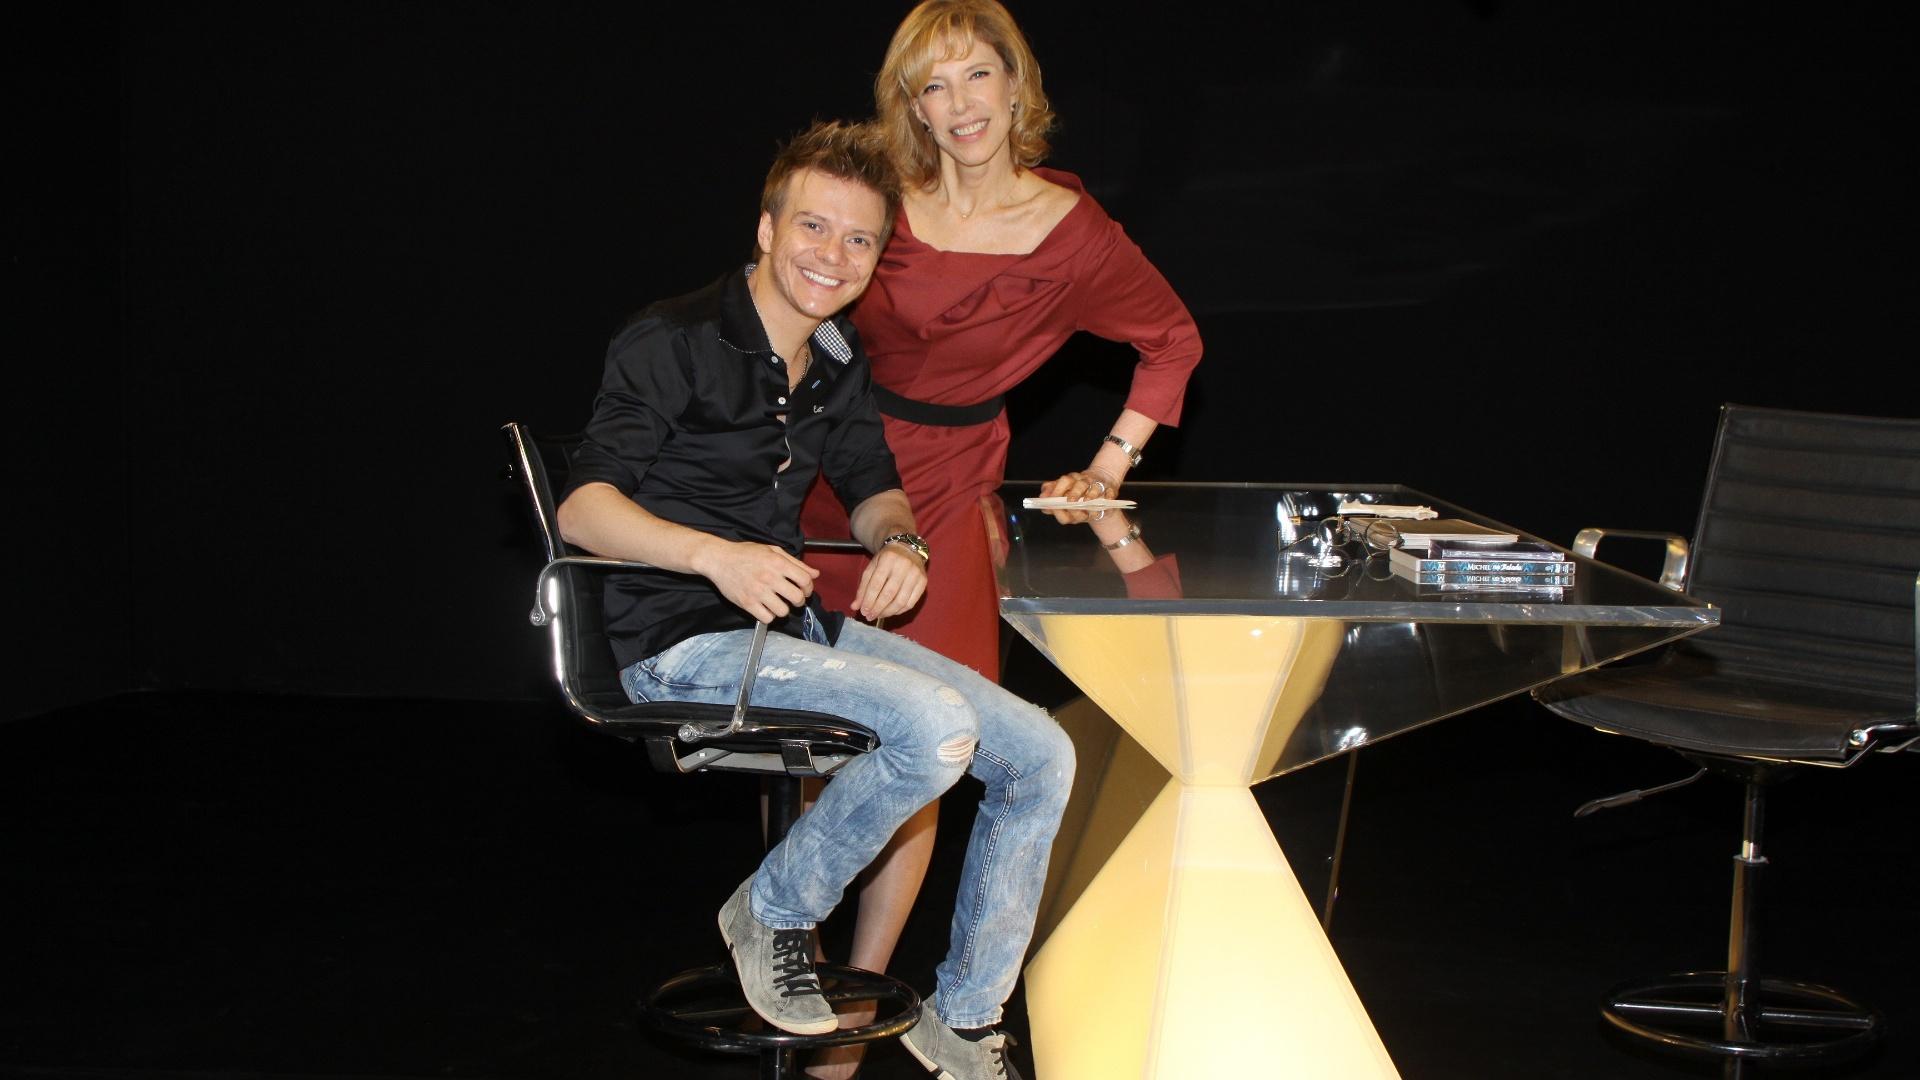 Michel Teló e Marília Gabriela no estúdio do